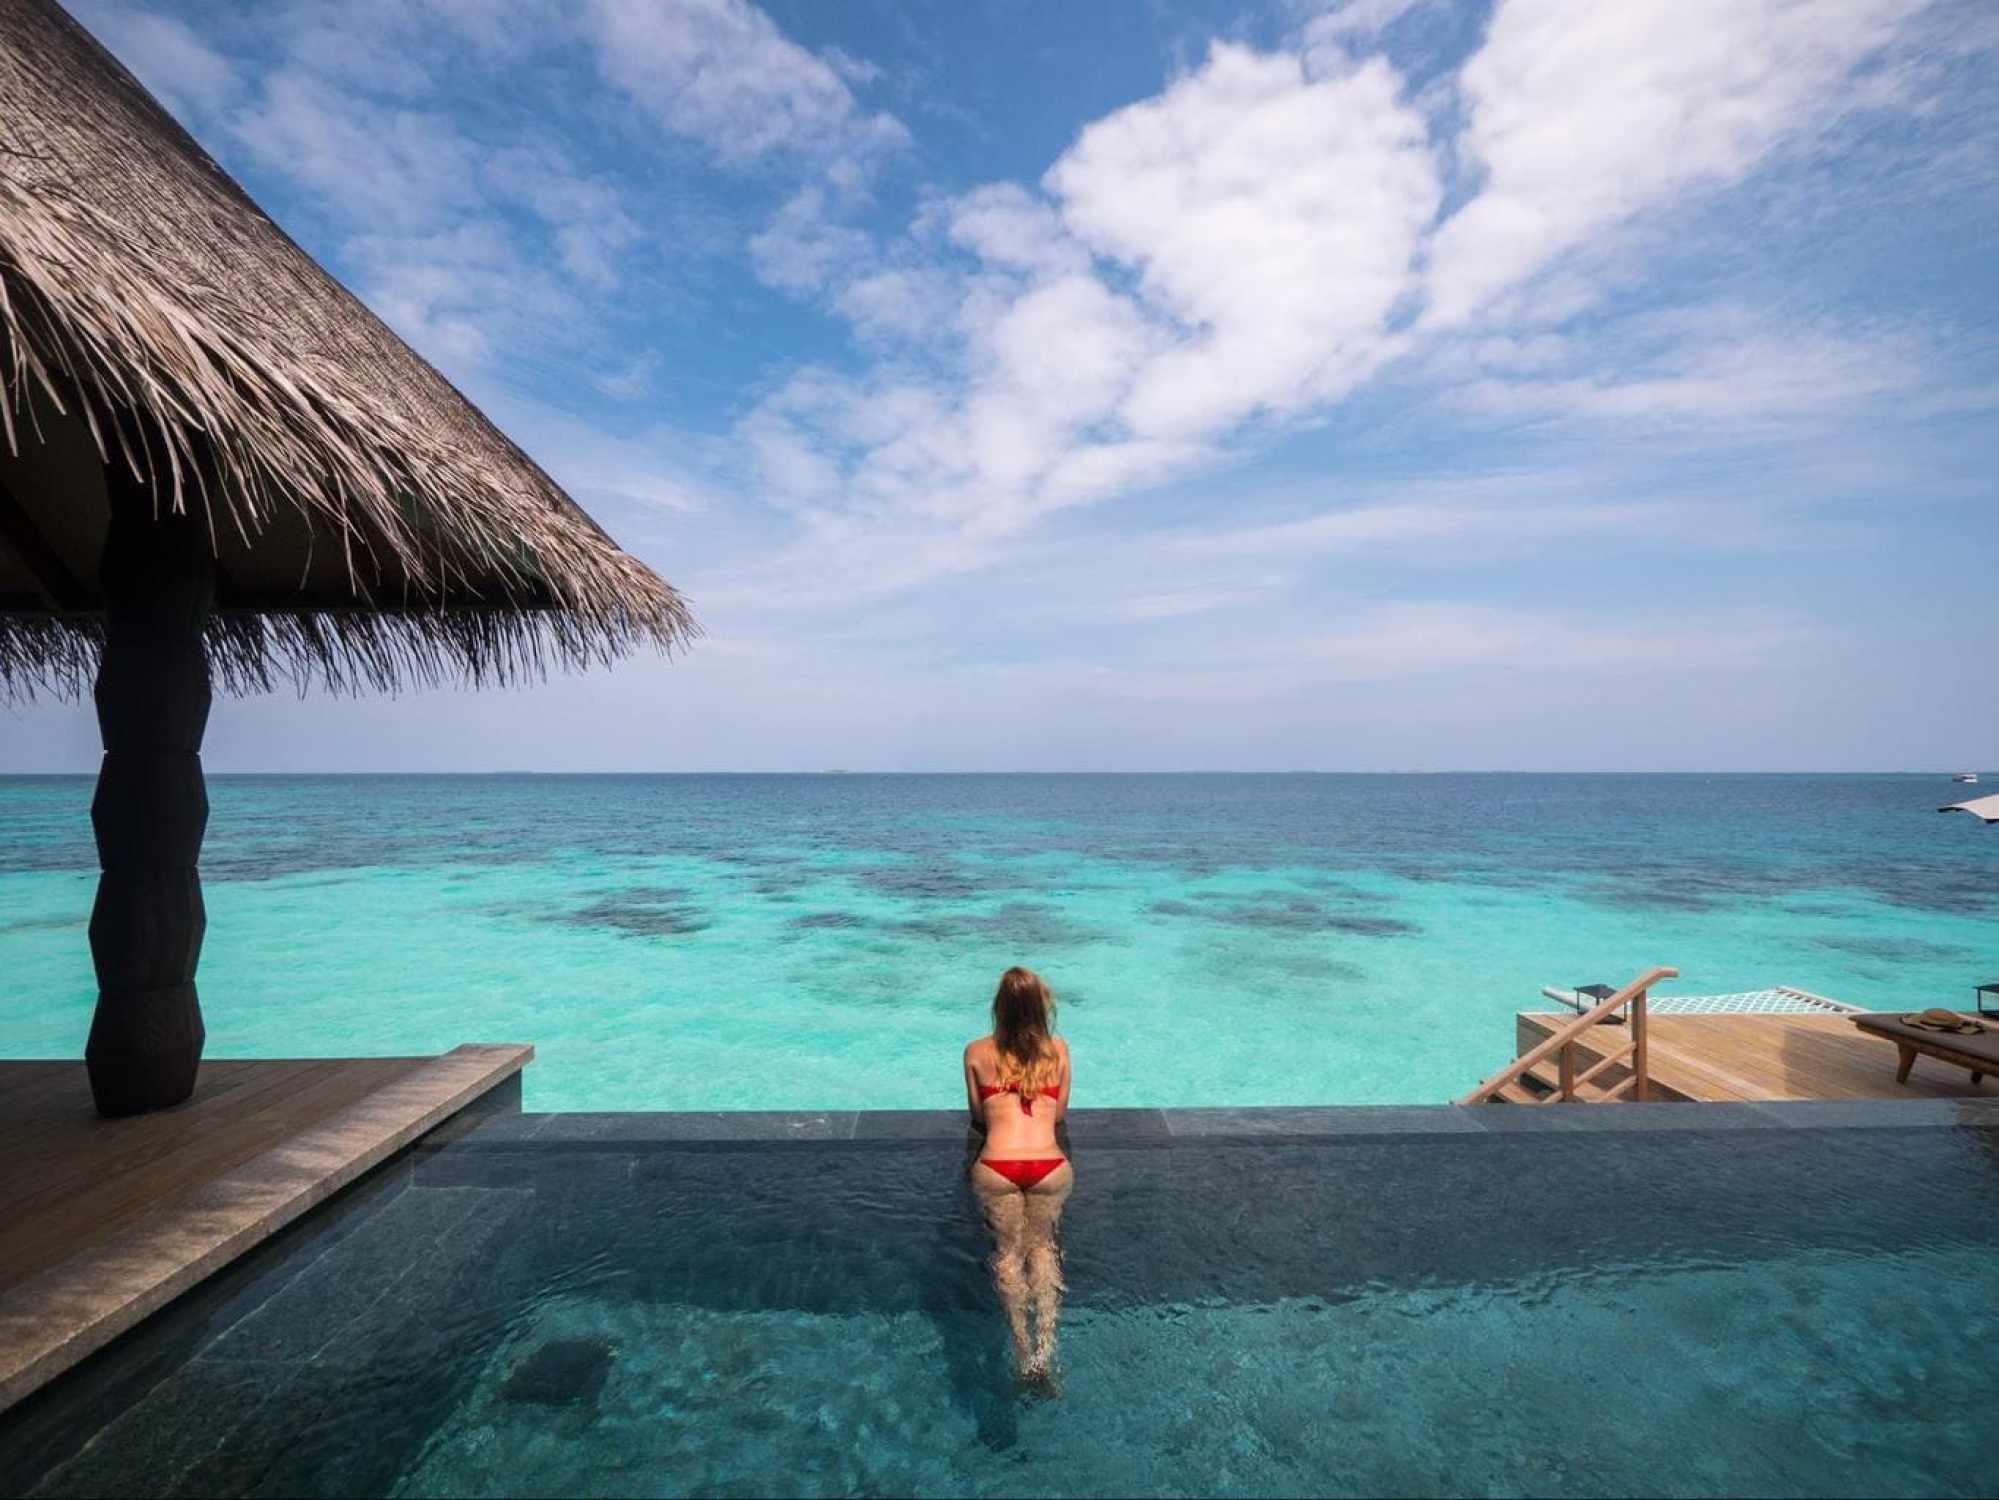 Infinity pool of the over water villas at Joali Maldives